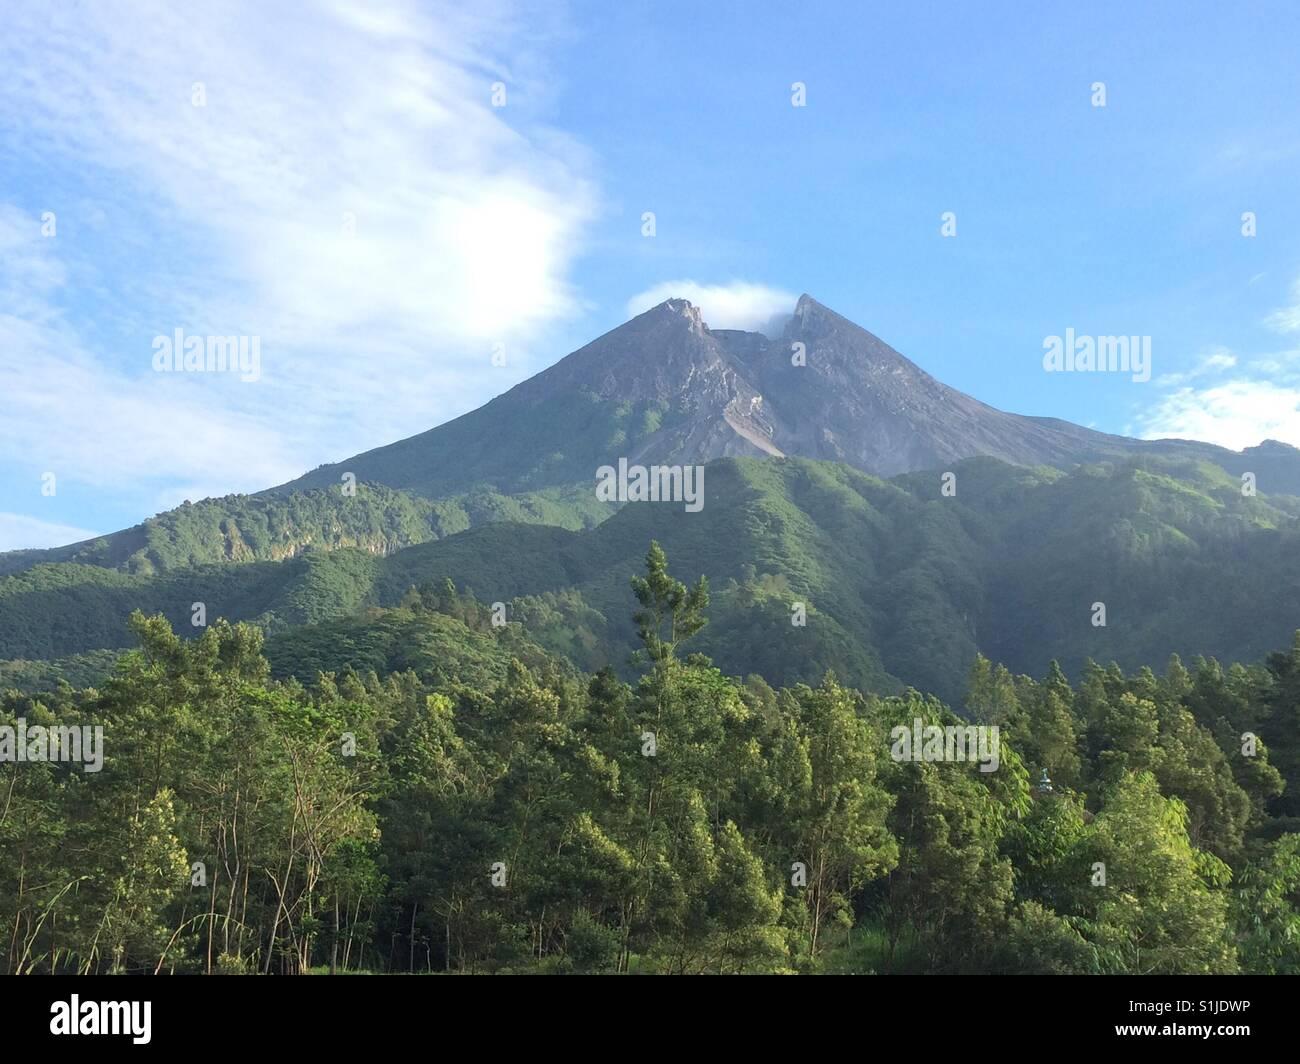 Merapi volcano - Stock Image